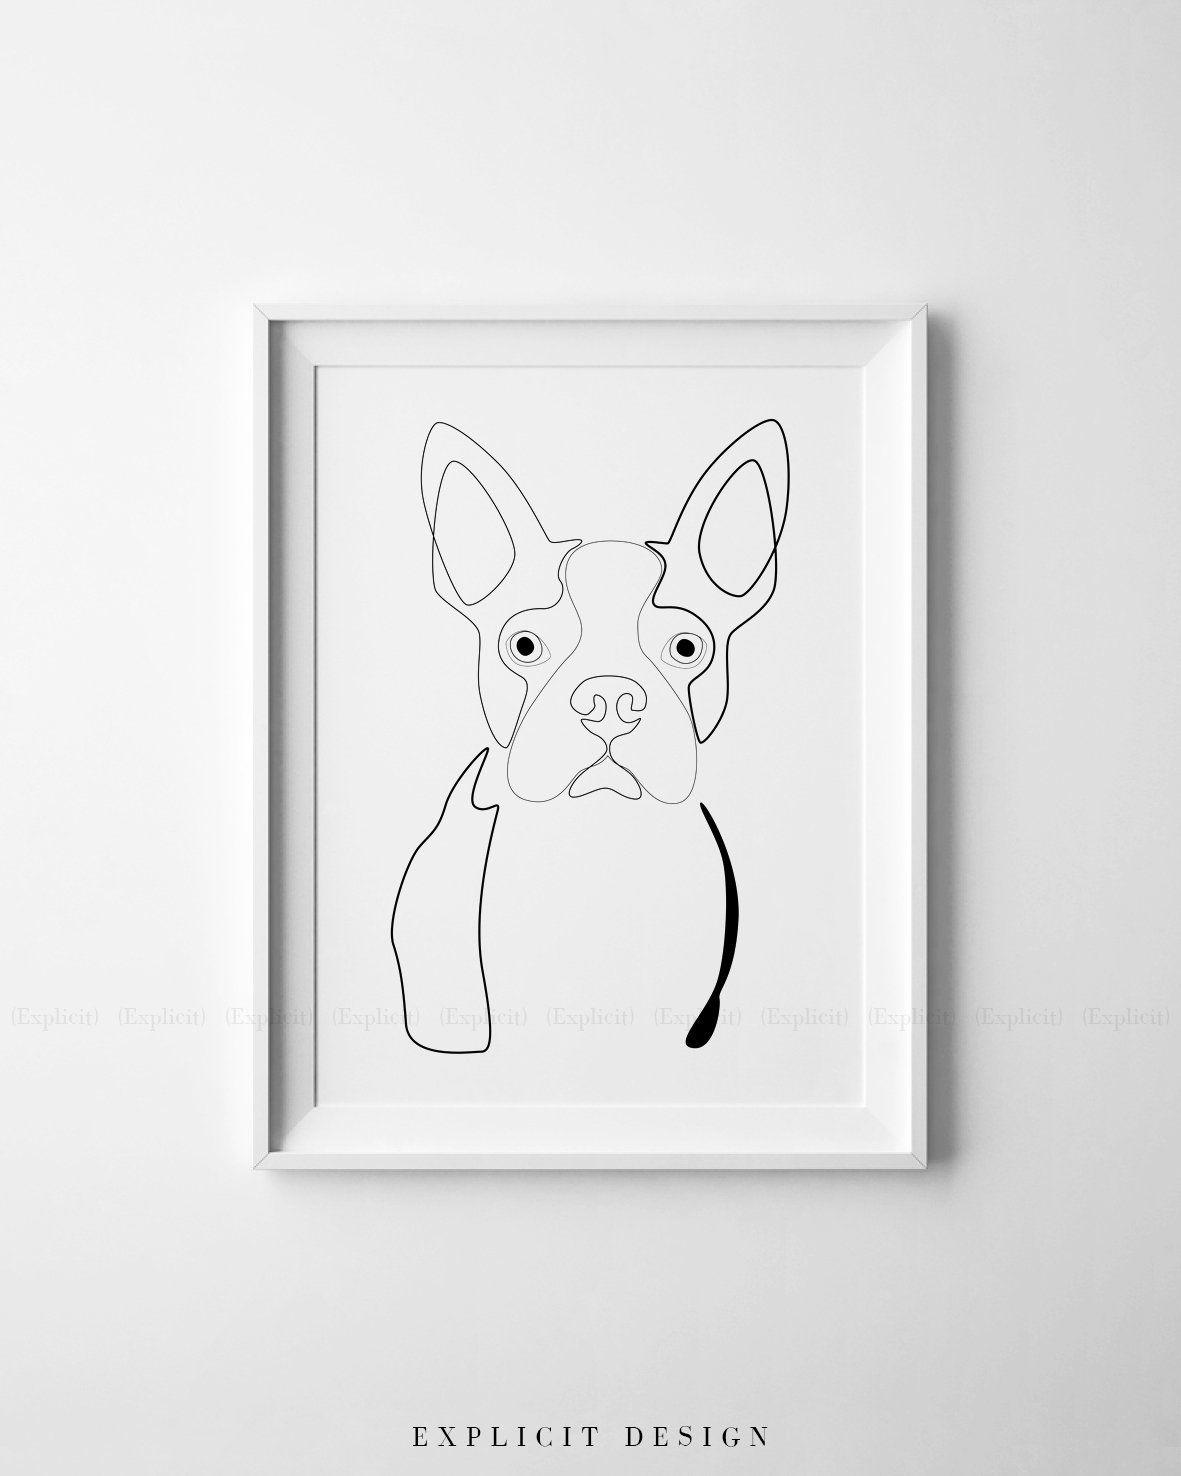 Boston Terrier Illustration Printable Abstract Dog Drawing In Etsy Dog Line Art Boston Terrier Illustration Dog Drawing